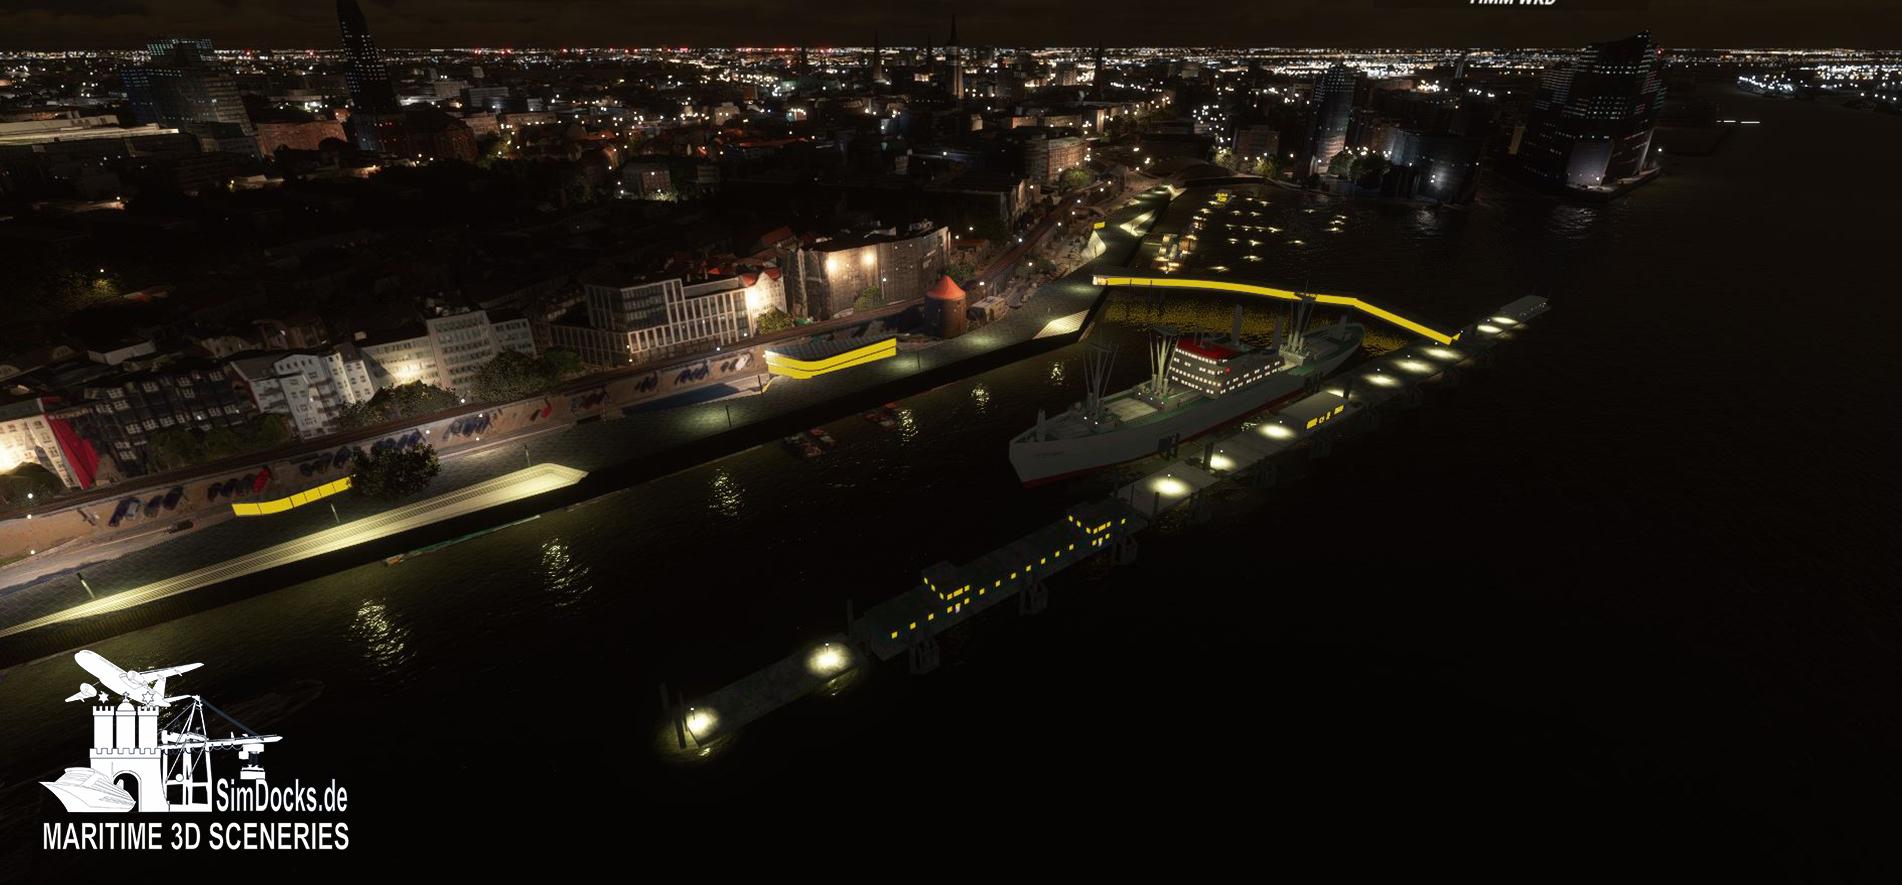 Bild2-Promenade_Ueberseebruecke_Nacht.JPG